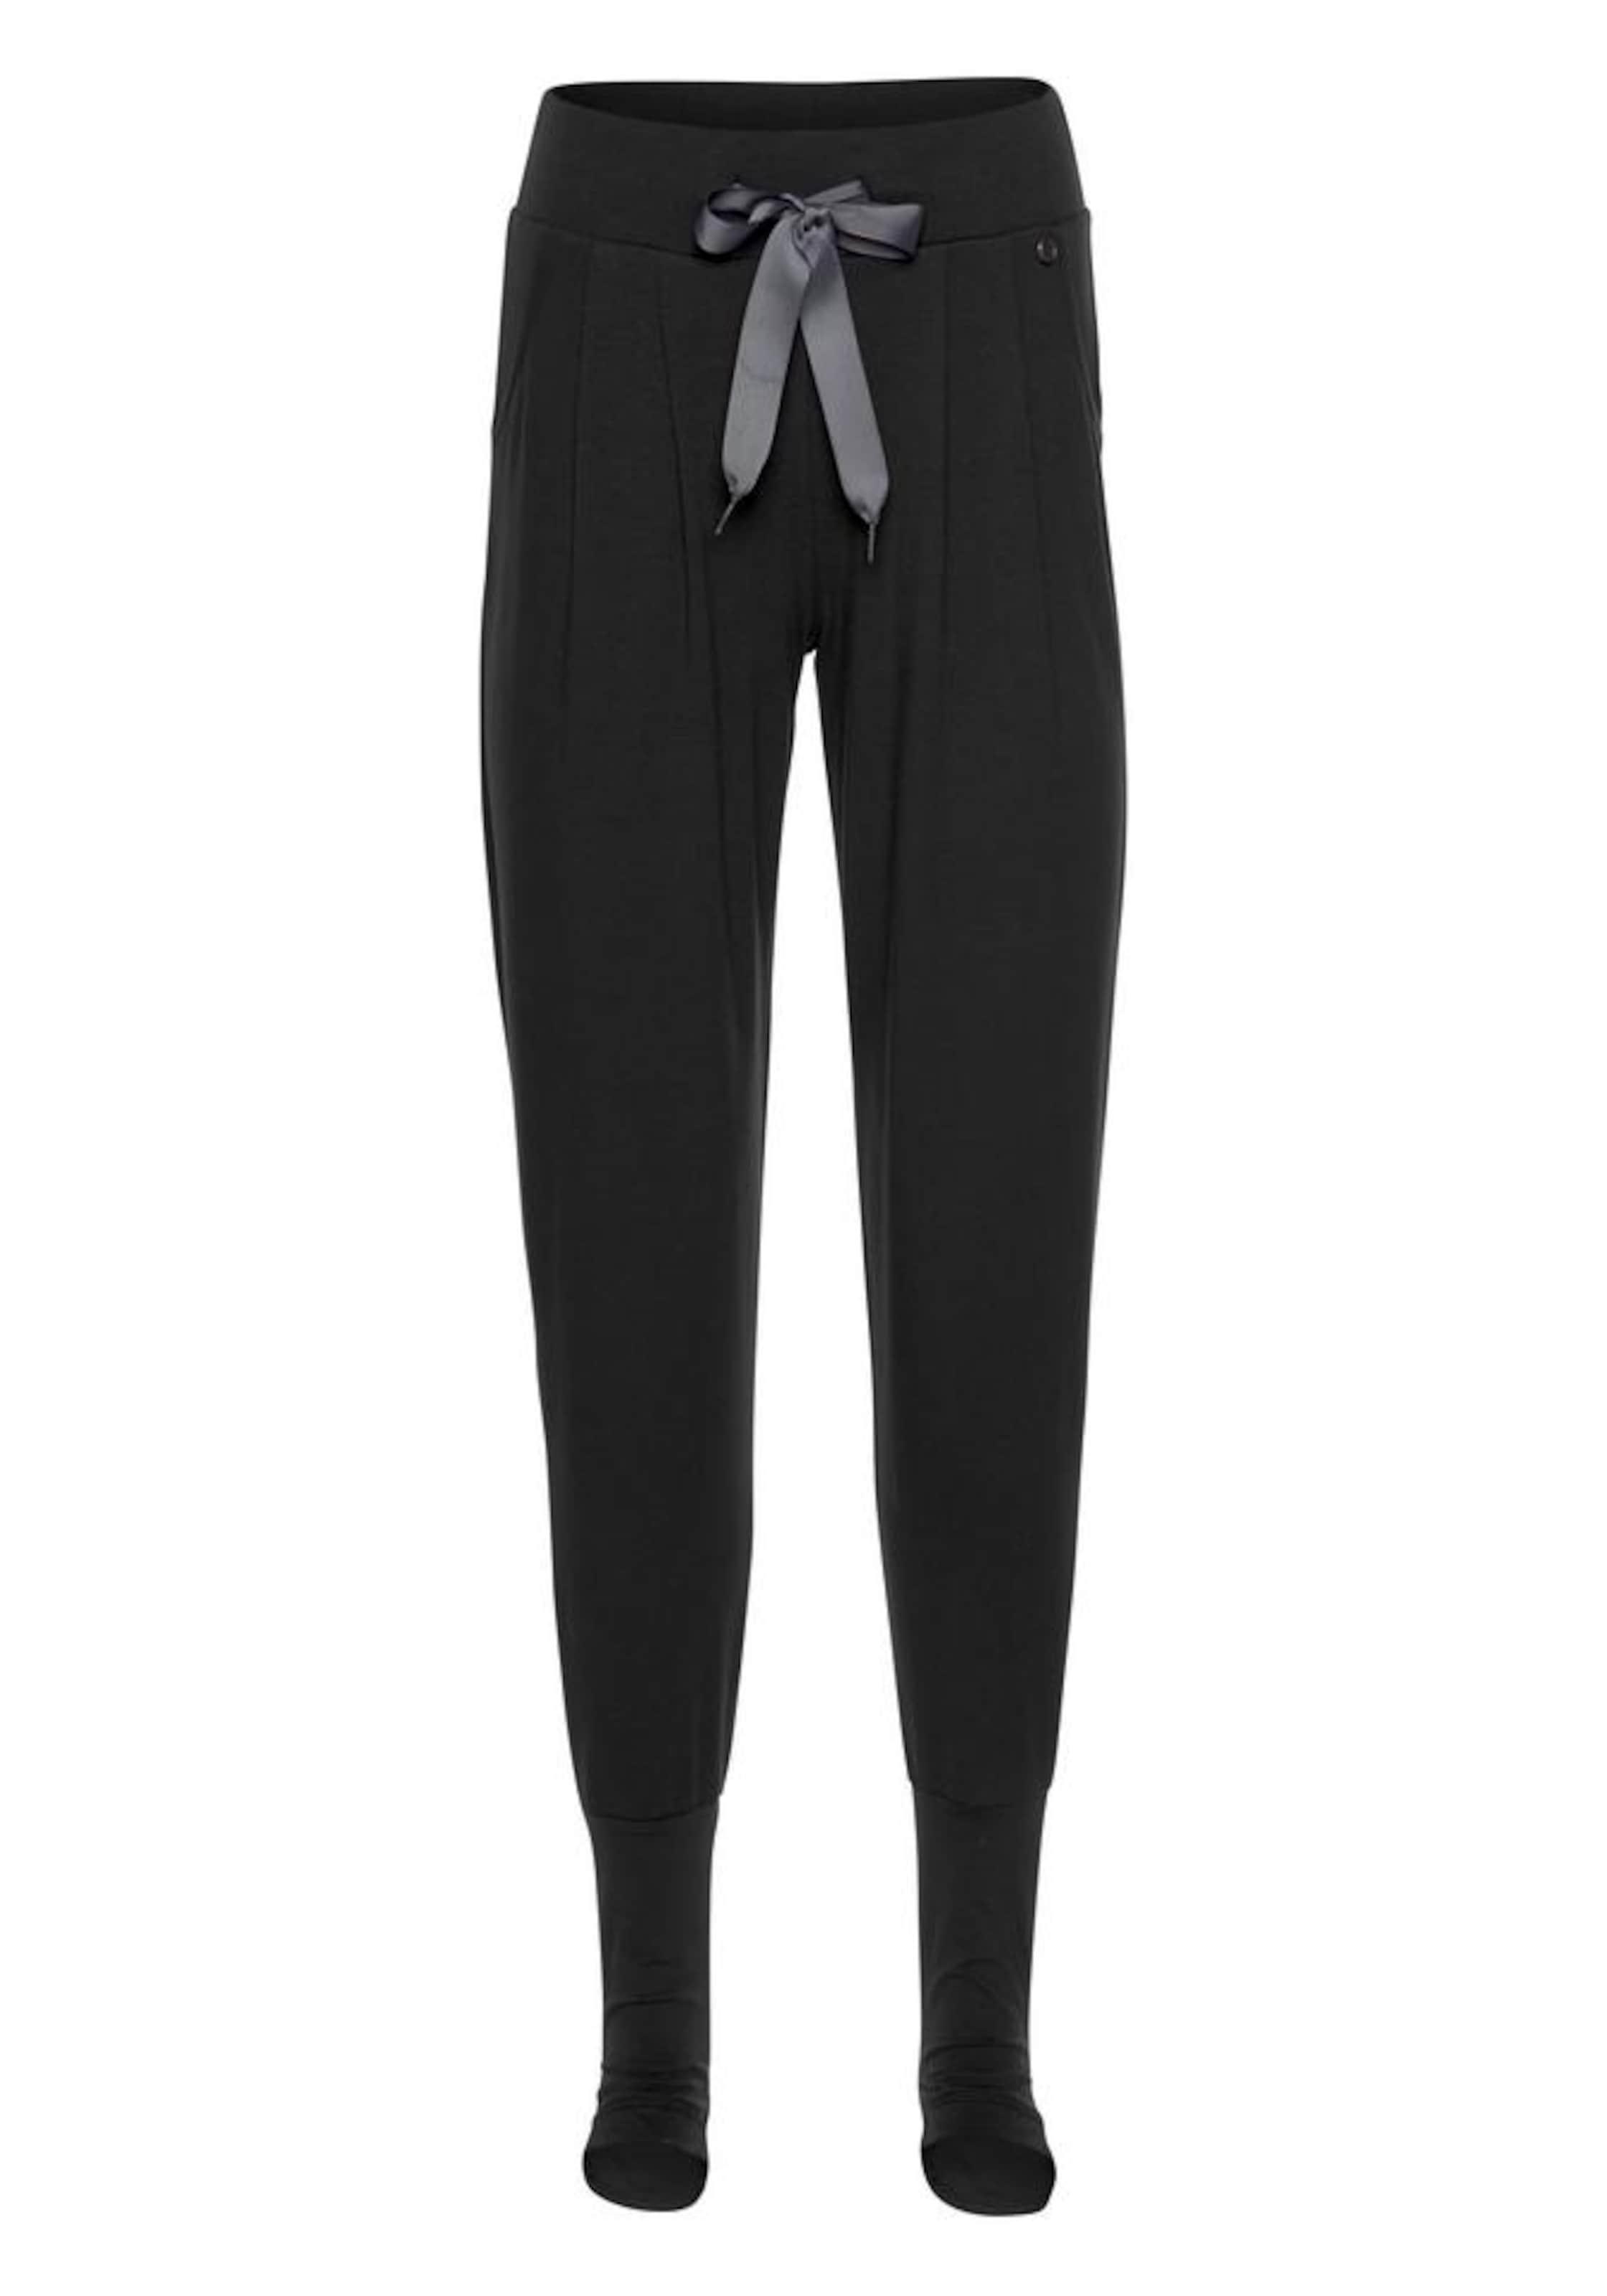 Sportswear In Ocean Yogahose Yogahose In Ocean Sportswear Yogahose Ocean Schwarz Sportswear Schwarz 5AjL4q3R